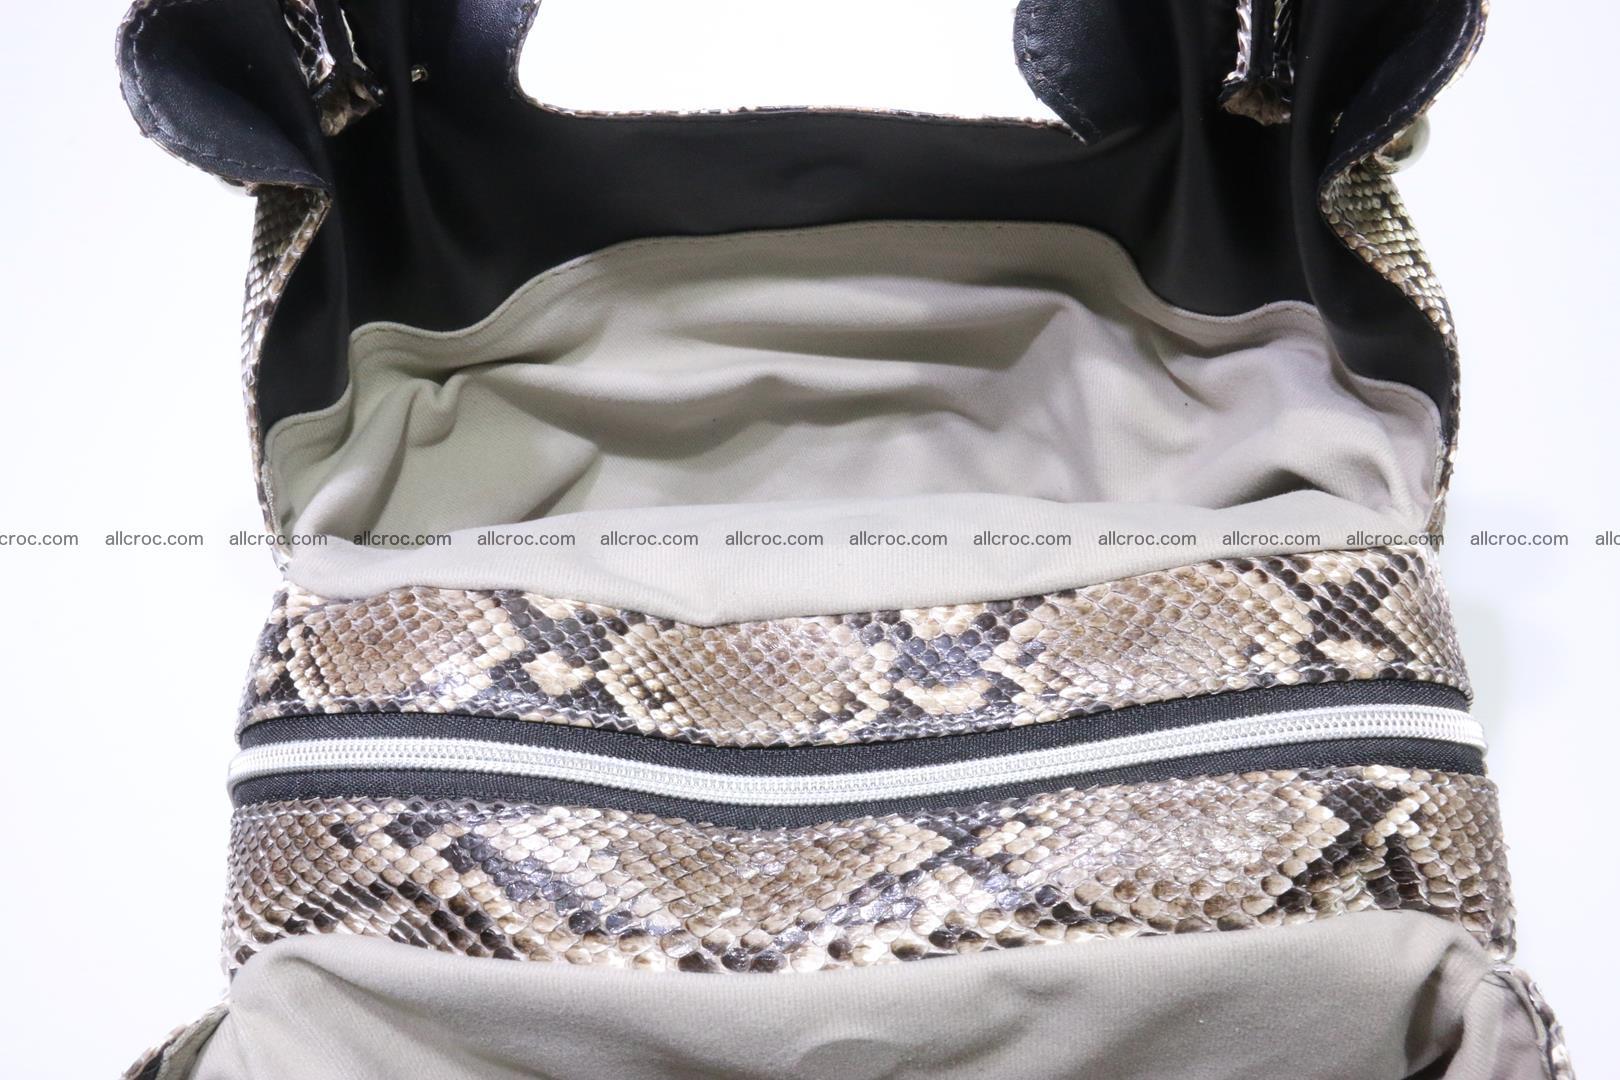 Python skin handbag for lady from genuine Python skin 202 Foto 12